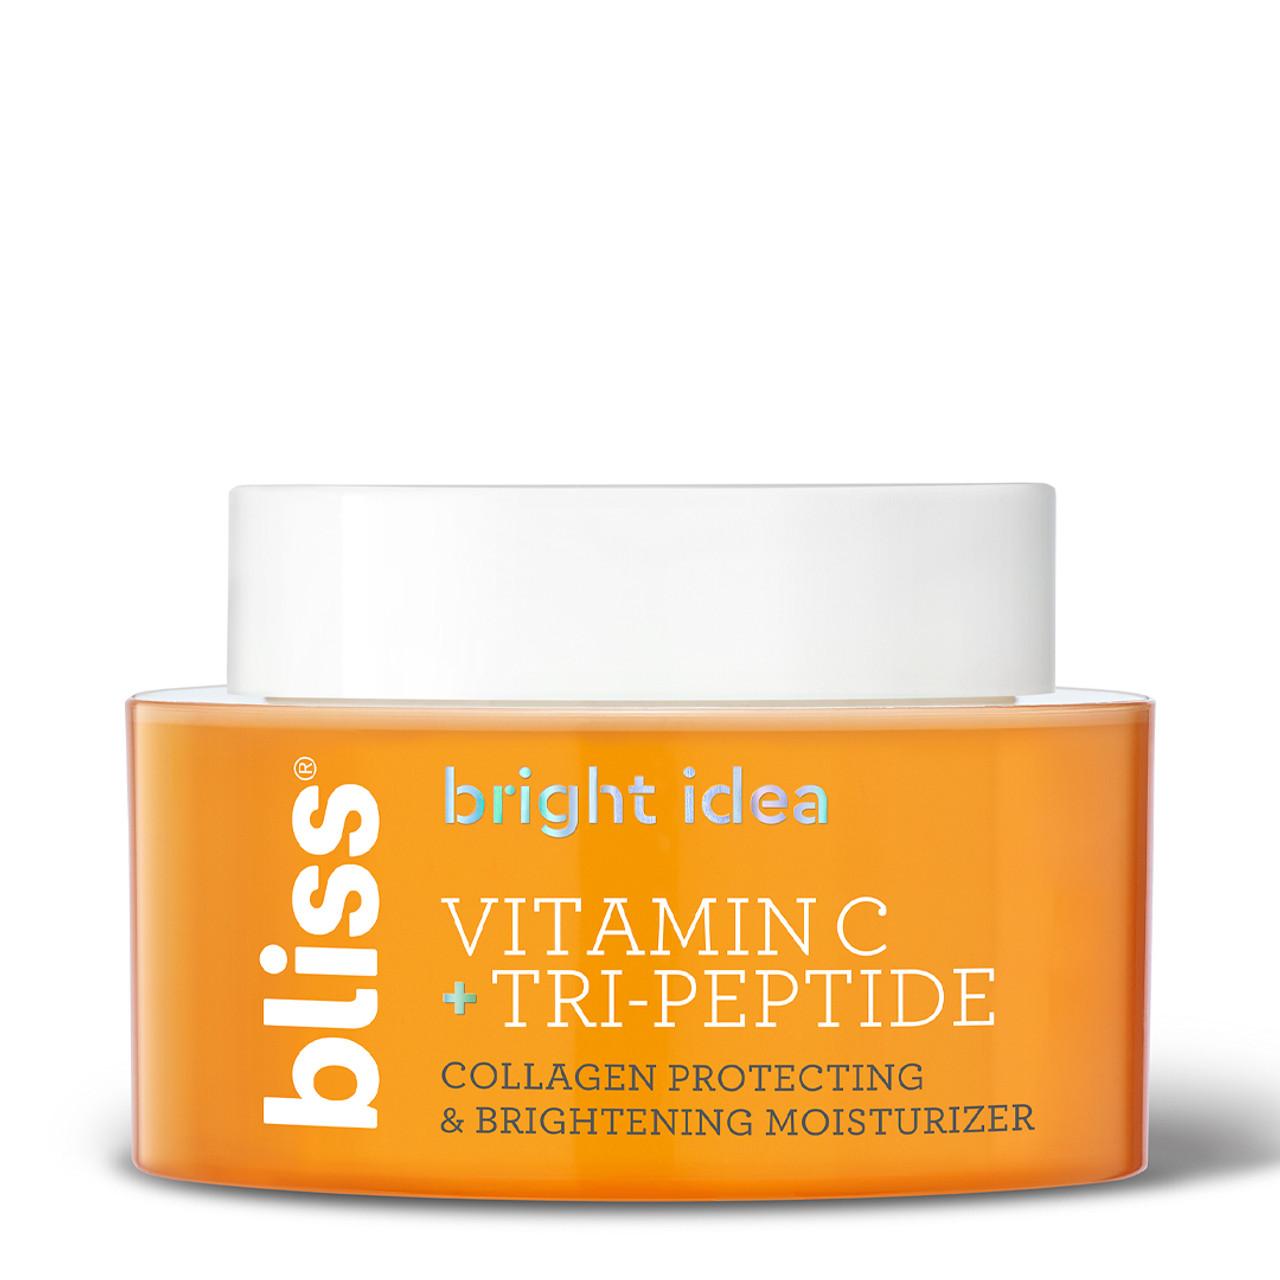 Bliss - Bright Idea Vitamin C Moisturizer